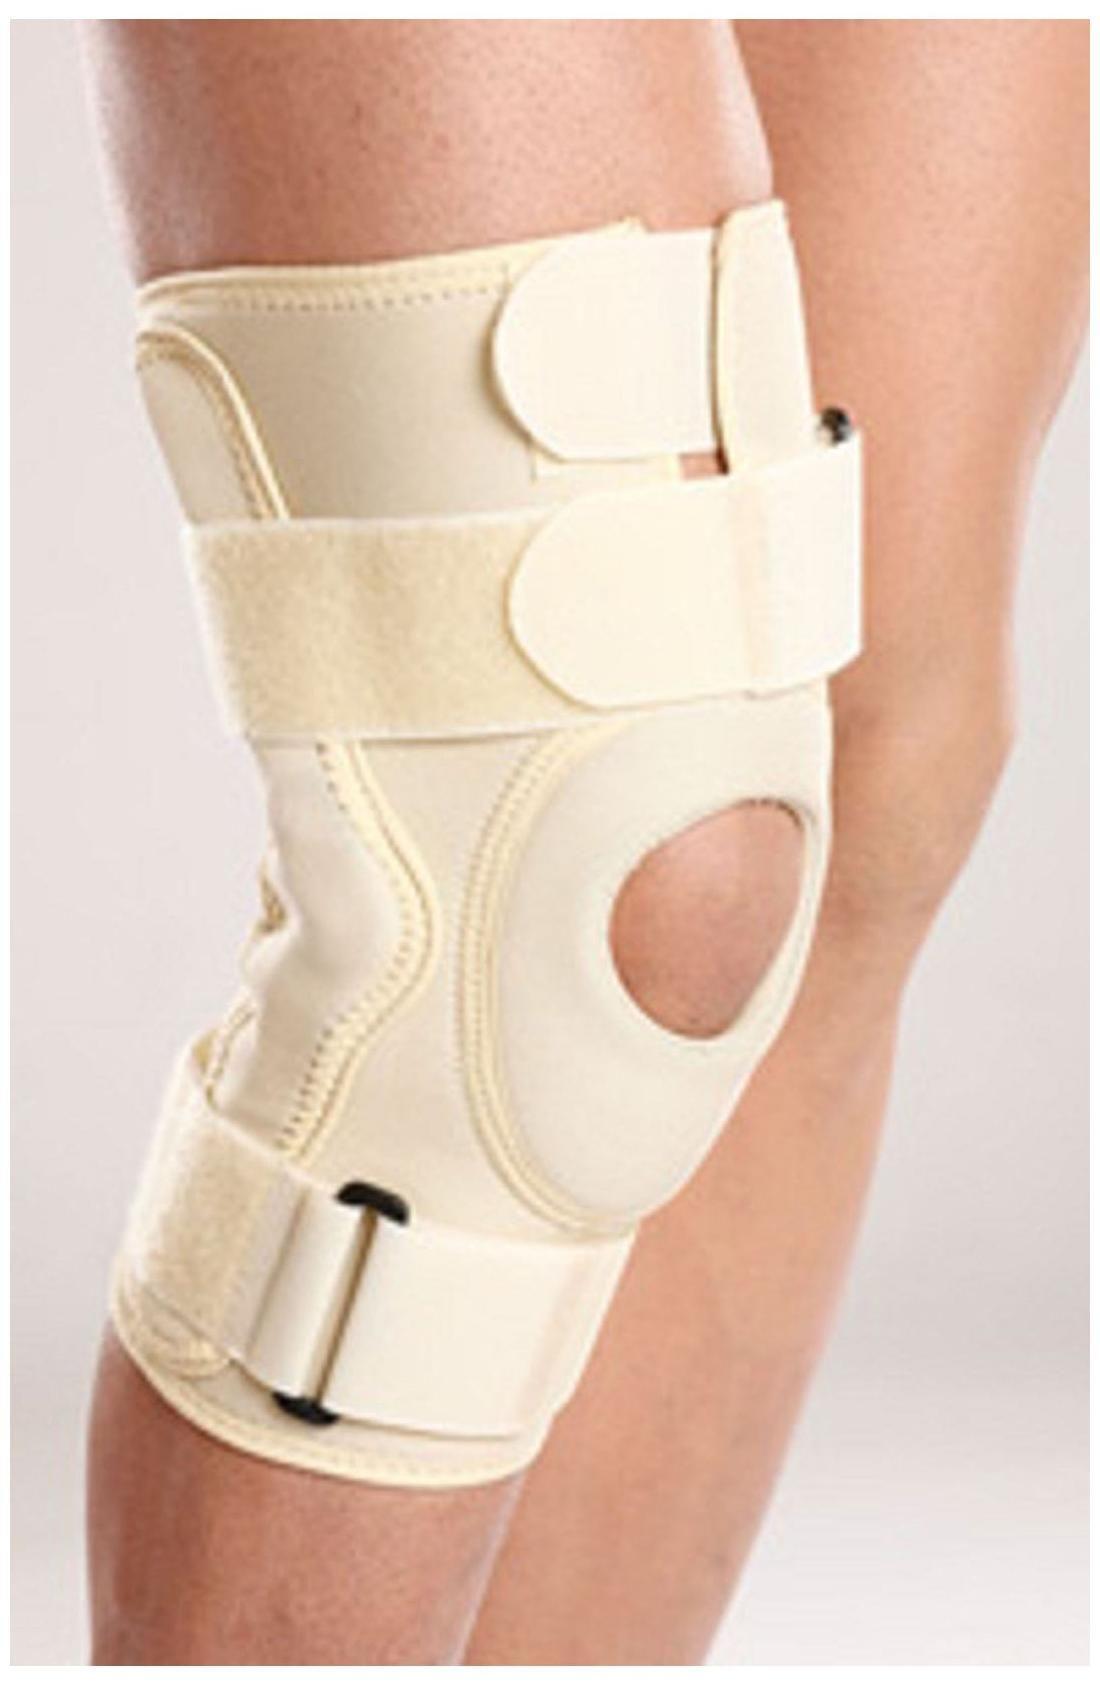 db596957db Buy Knee Support Hinged(Neoprene) Medium by undefined, on Paytm, Price:  Rs.1100?utm_medium=pintrest